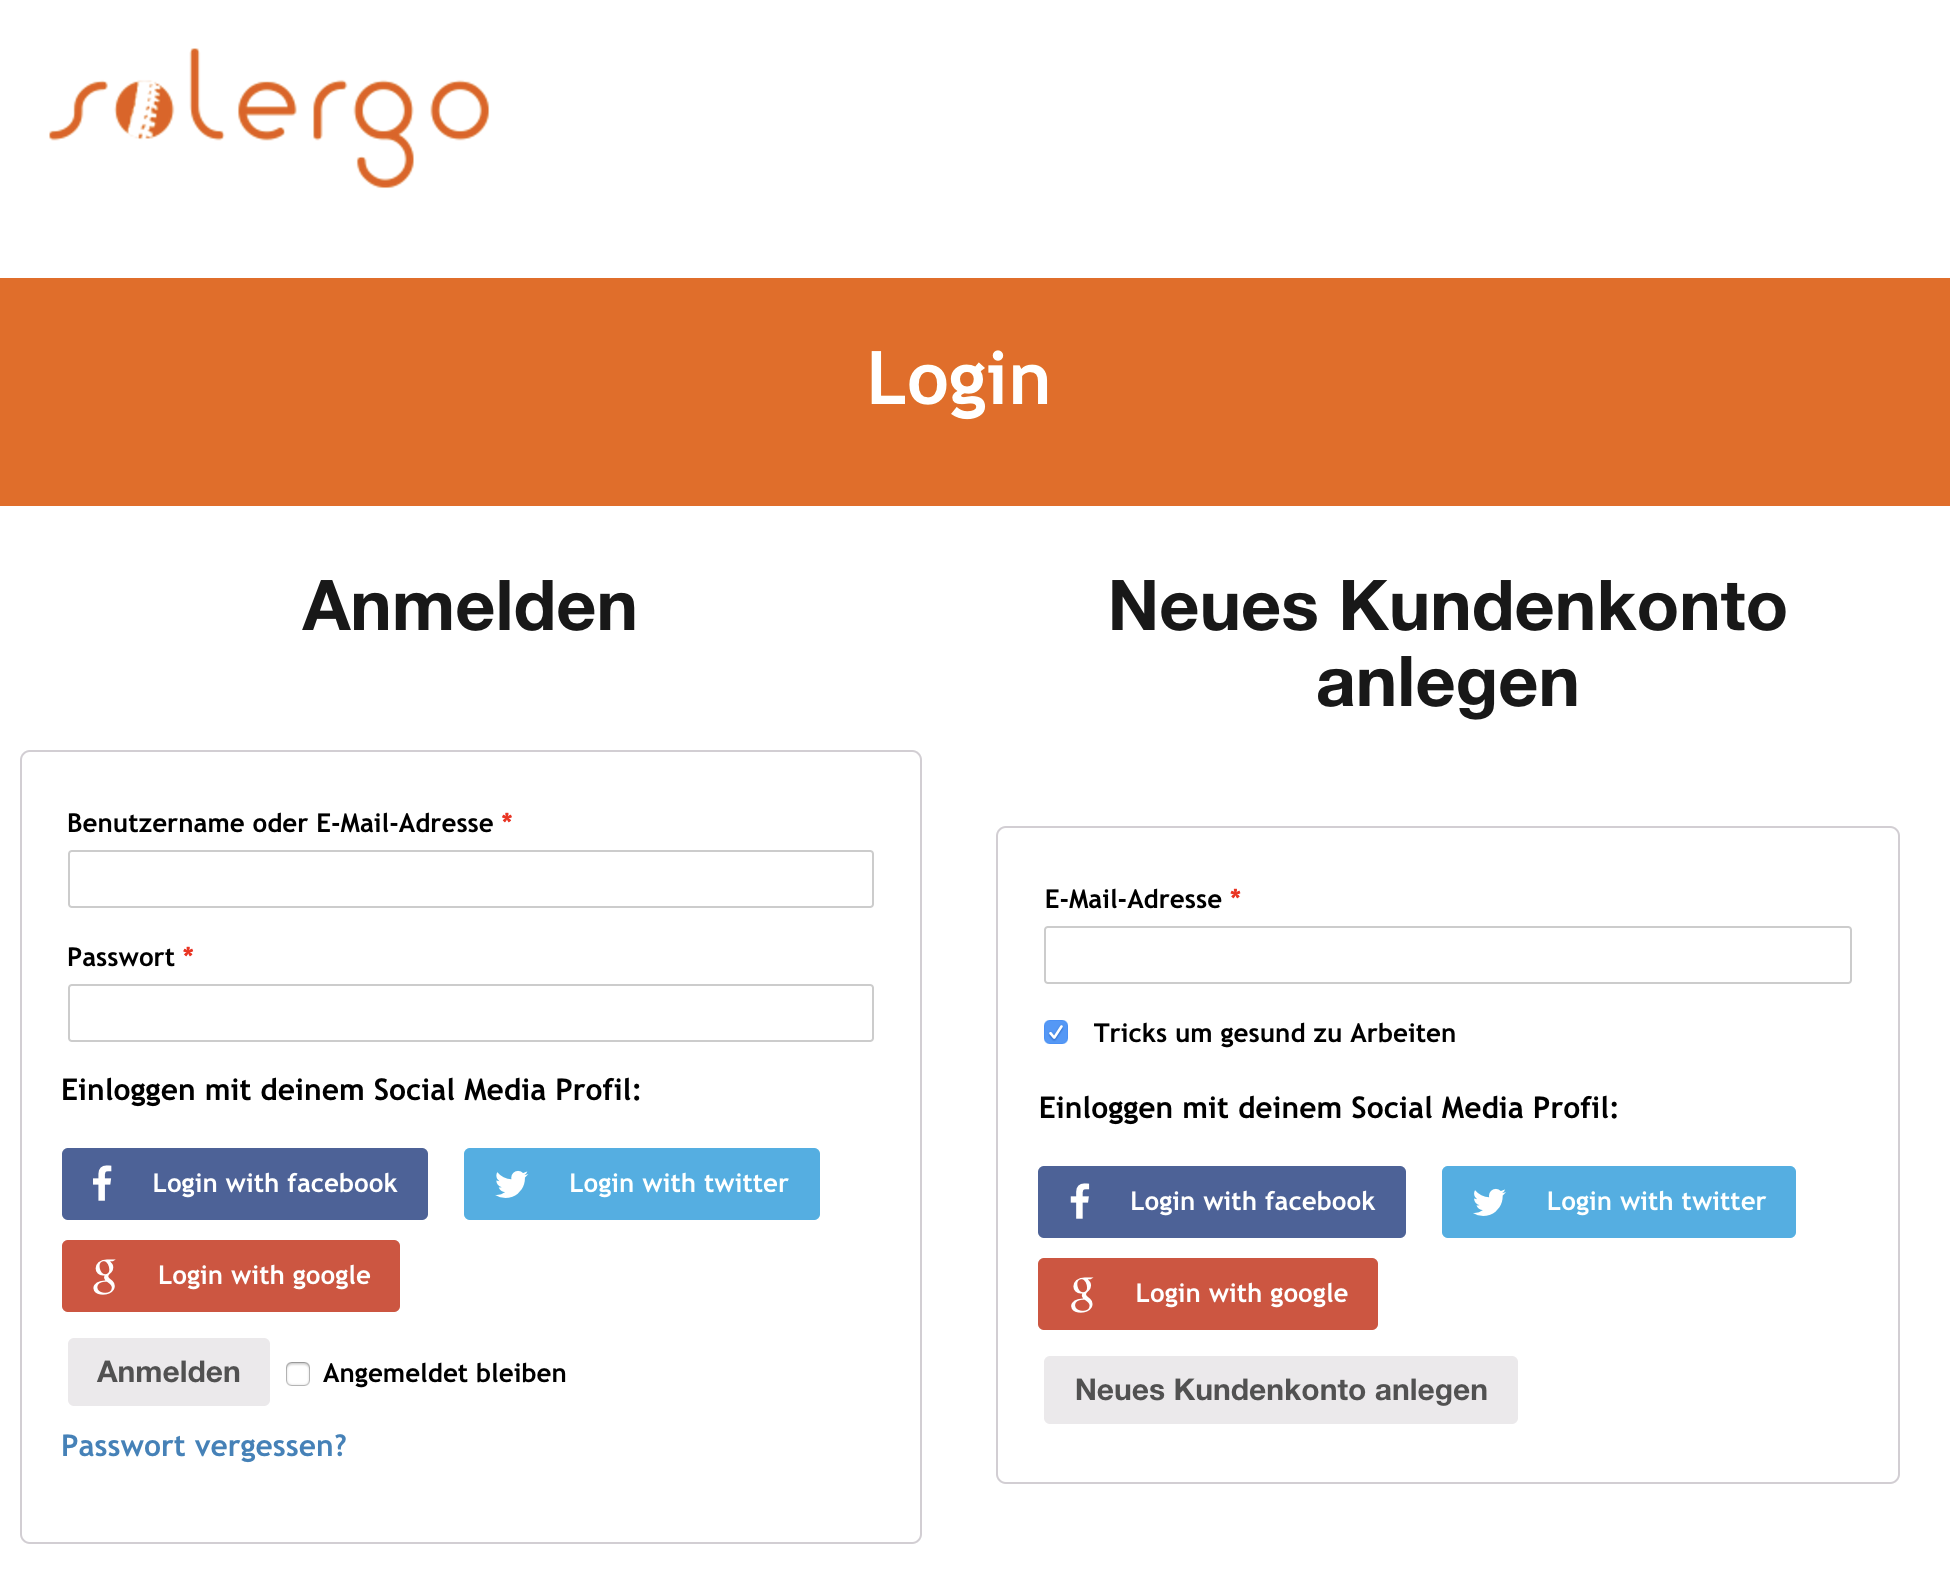 Login mit Social Media bei solergo.ch | Soziale medien